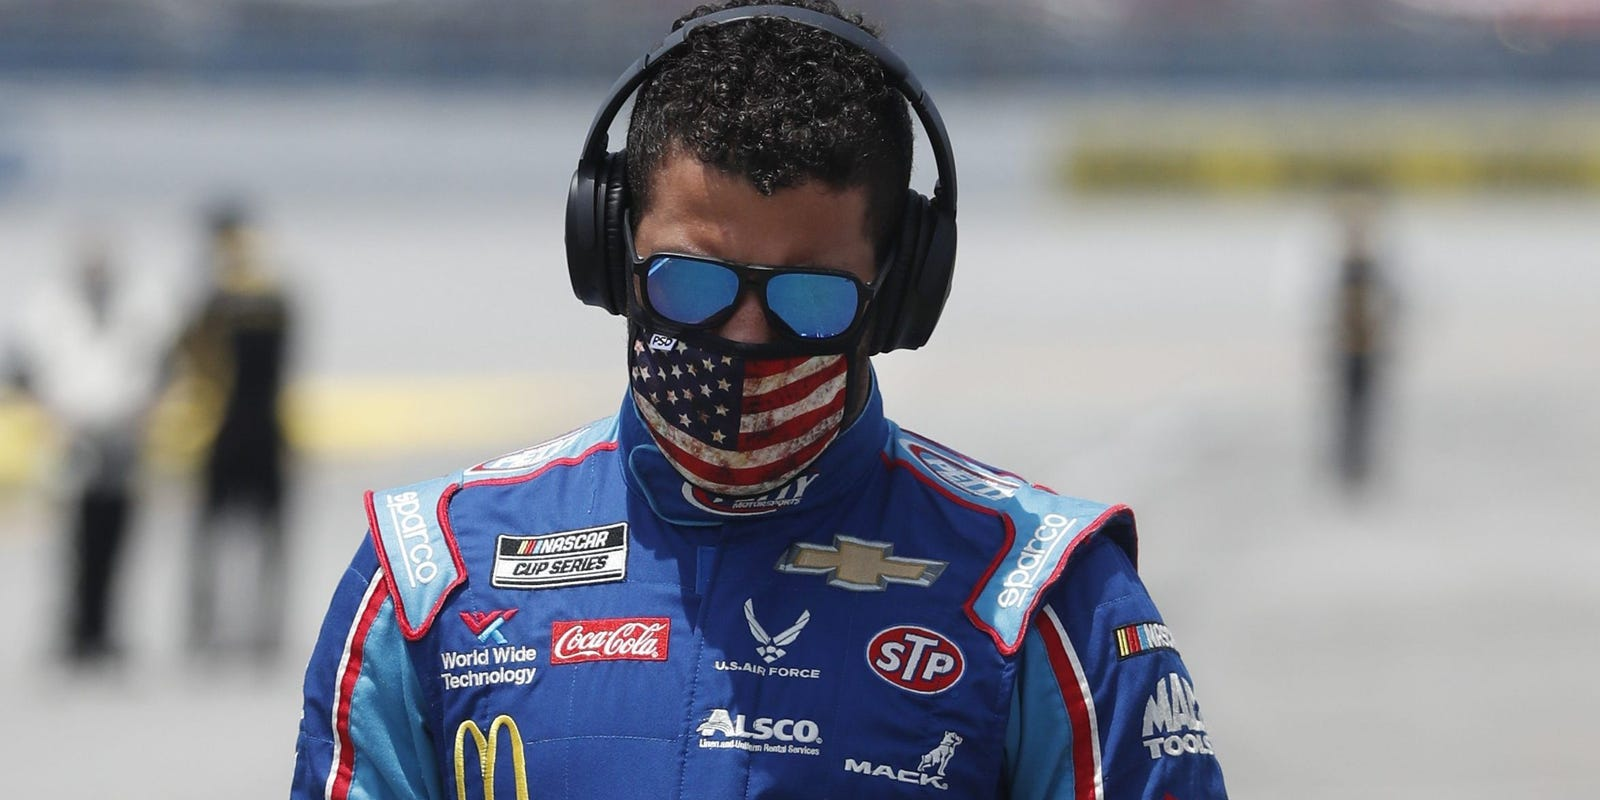 'Worn out' after Talladega, NASCAR noose incident